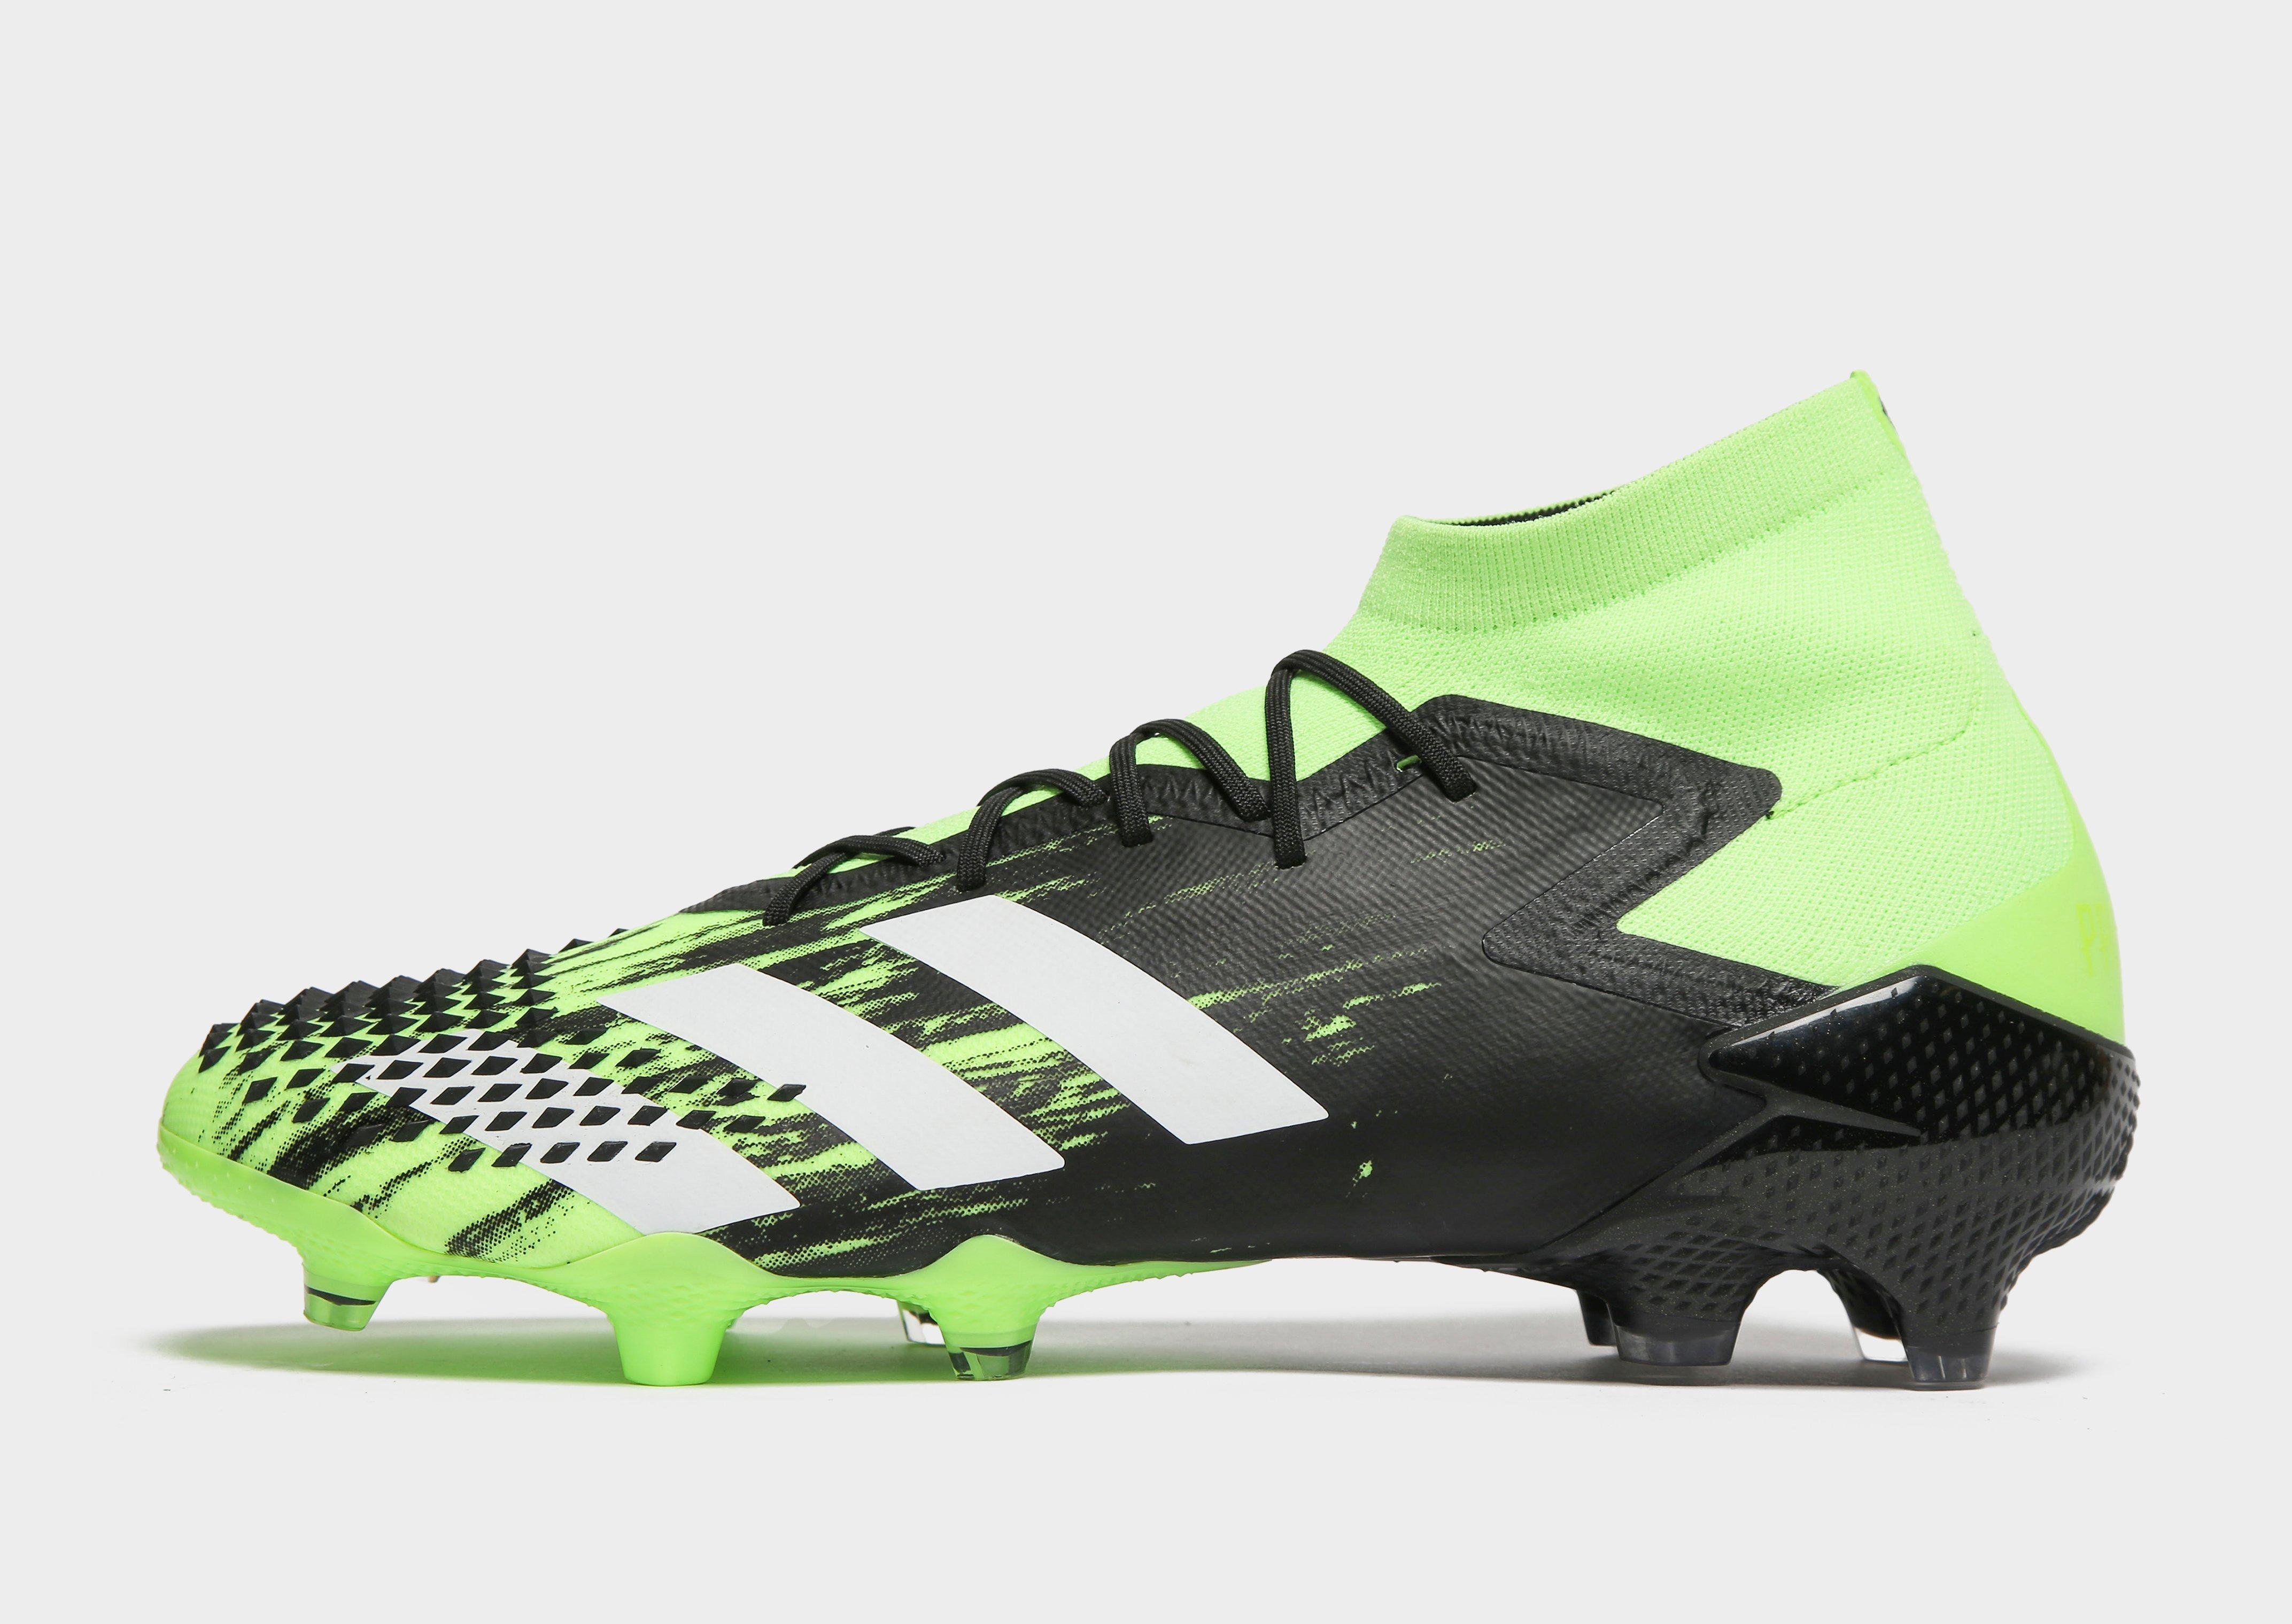 dar a entender Kenia Inhalar  Buy adidas Precision to Blur Predator 20.1 FG PRE ORDER   JD Sports